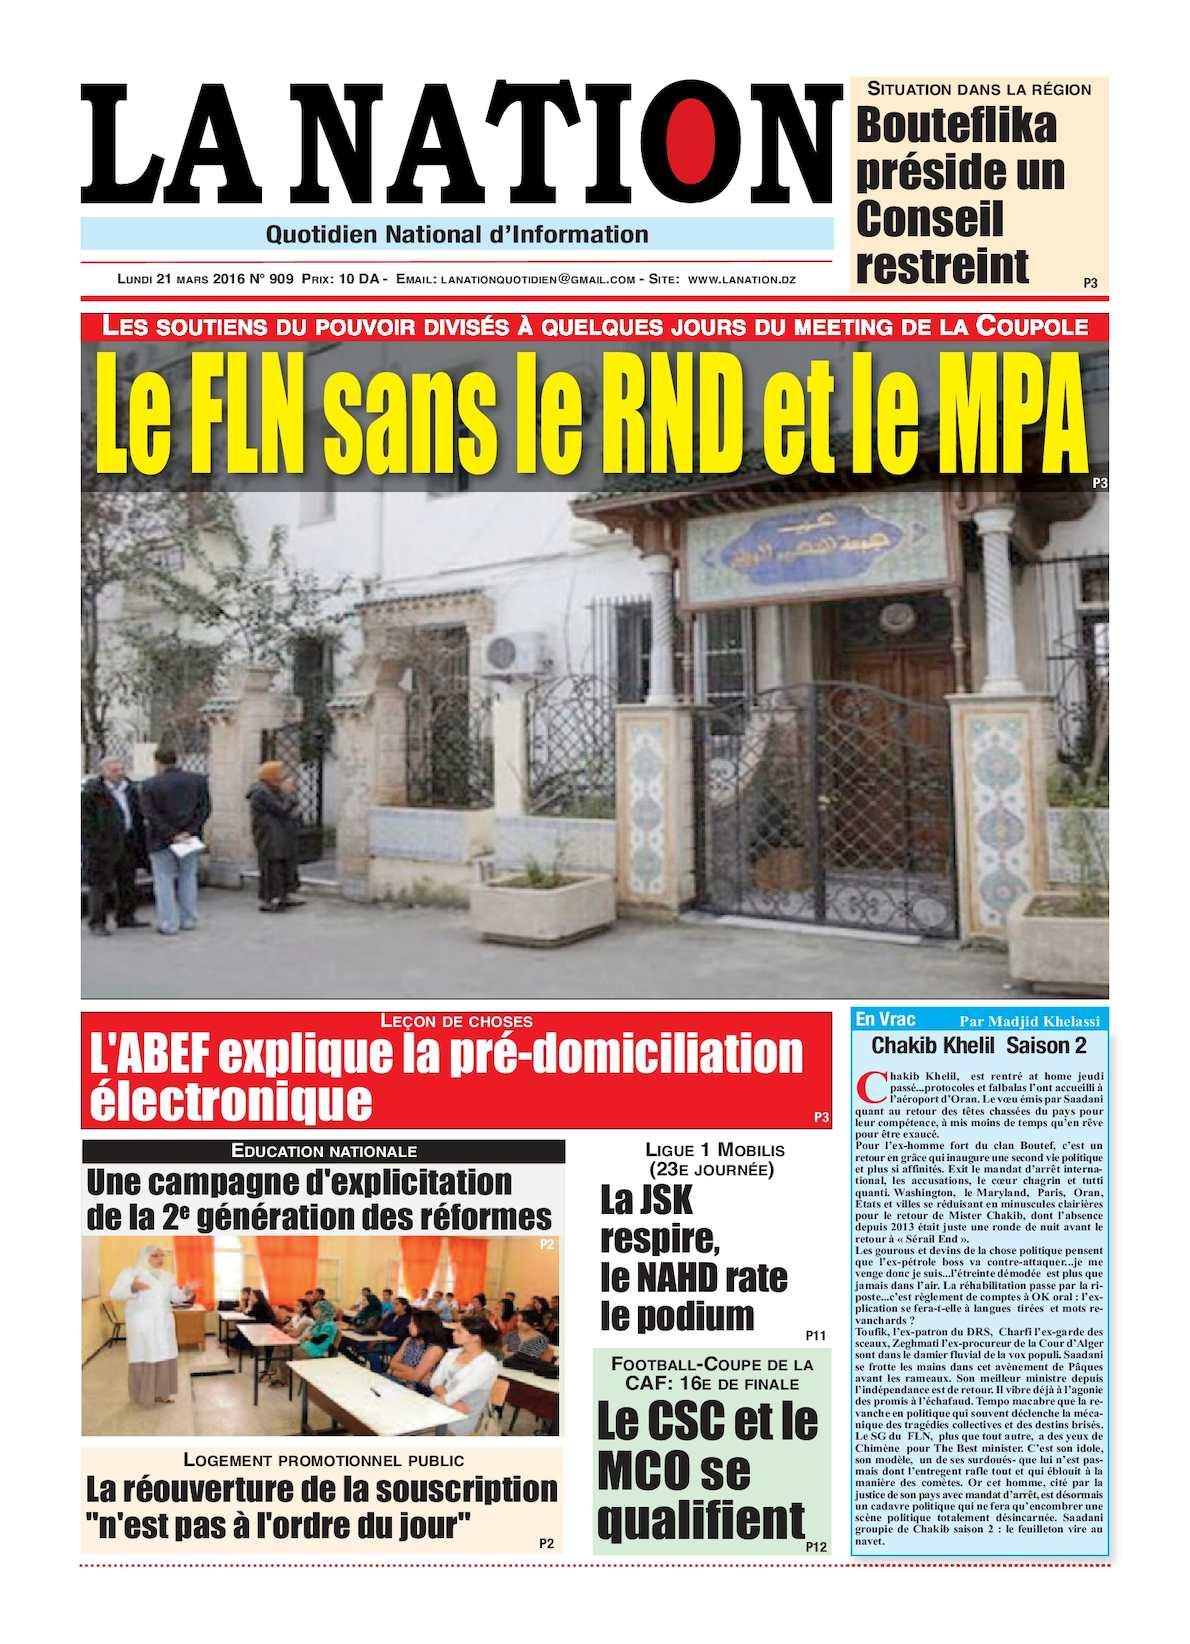 La Nation Edition N 909